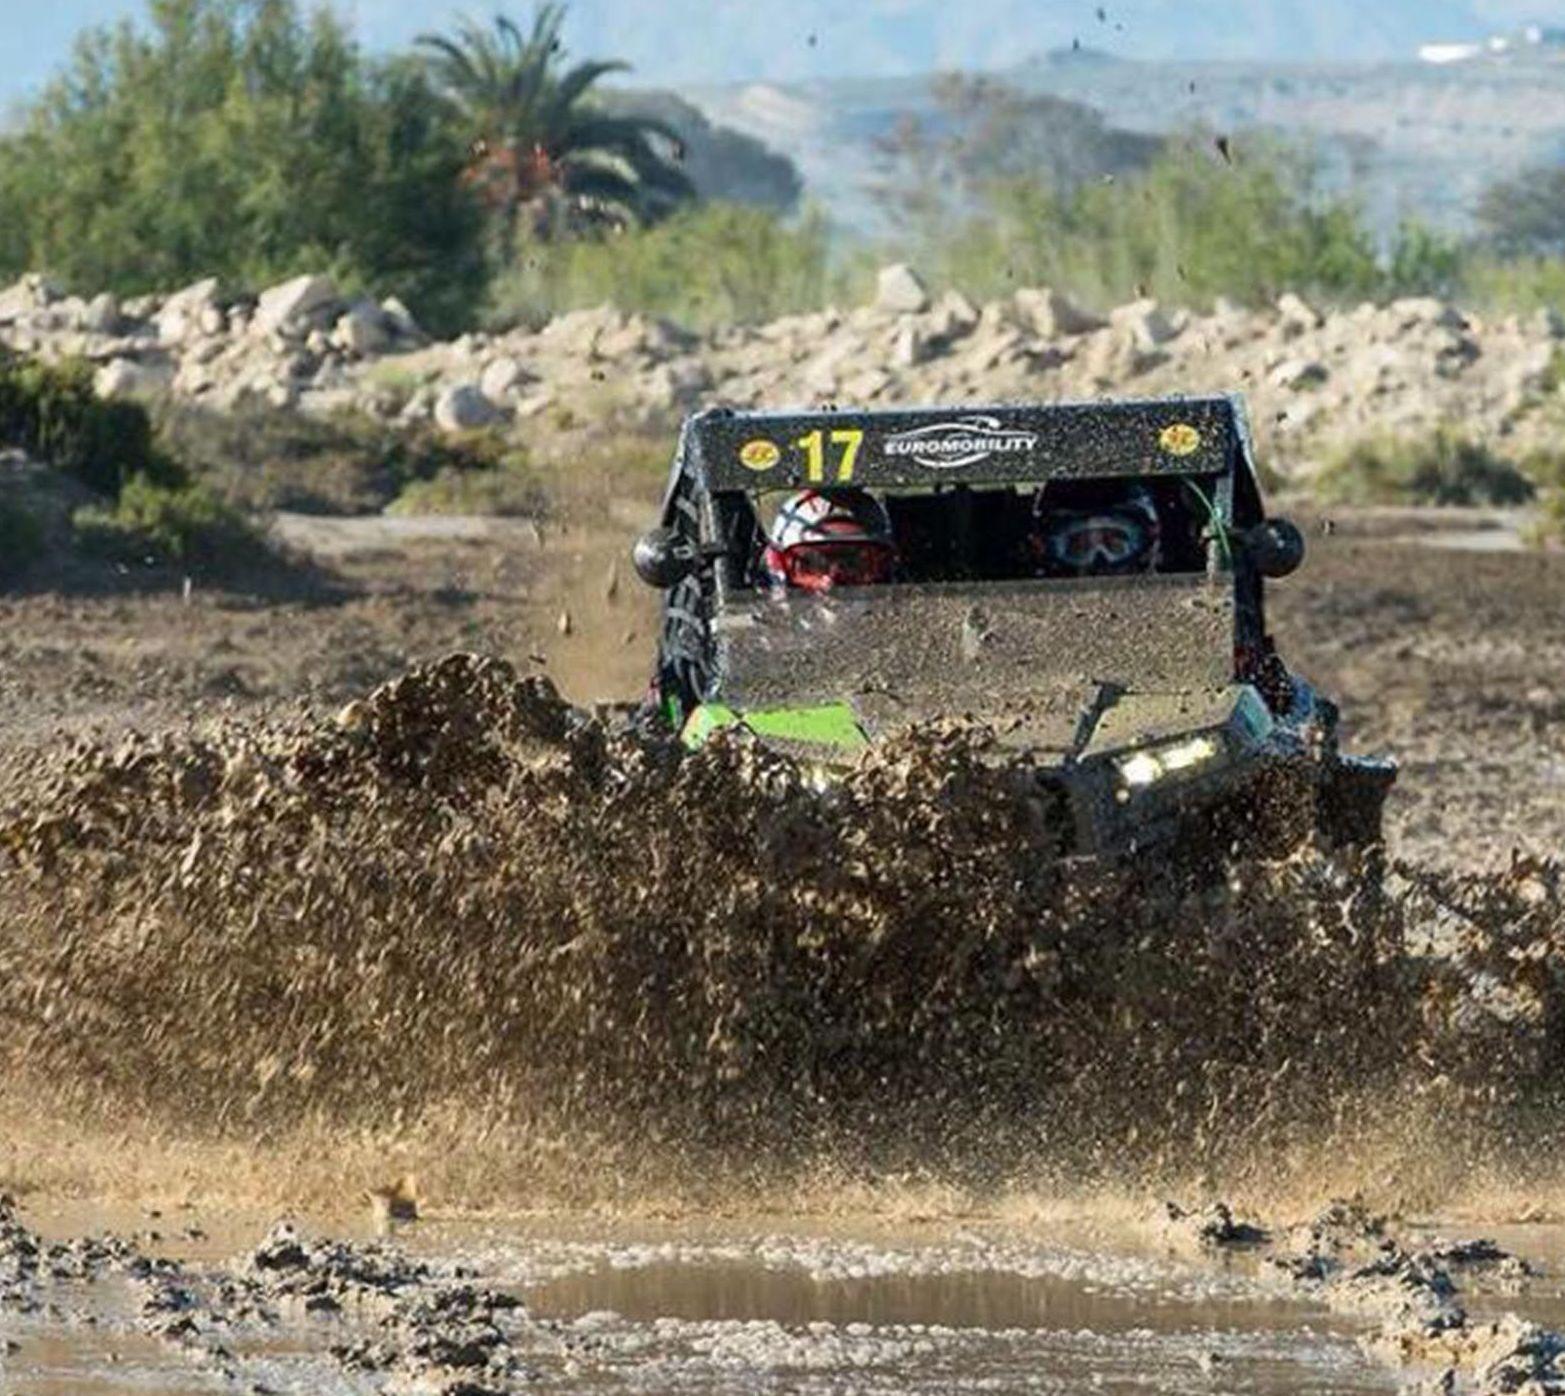 El piloto de Euromobility Joan Lascorz logra pódium en la baja Aragón.